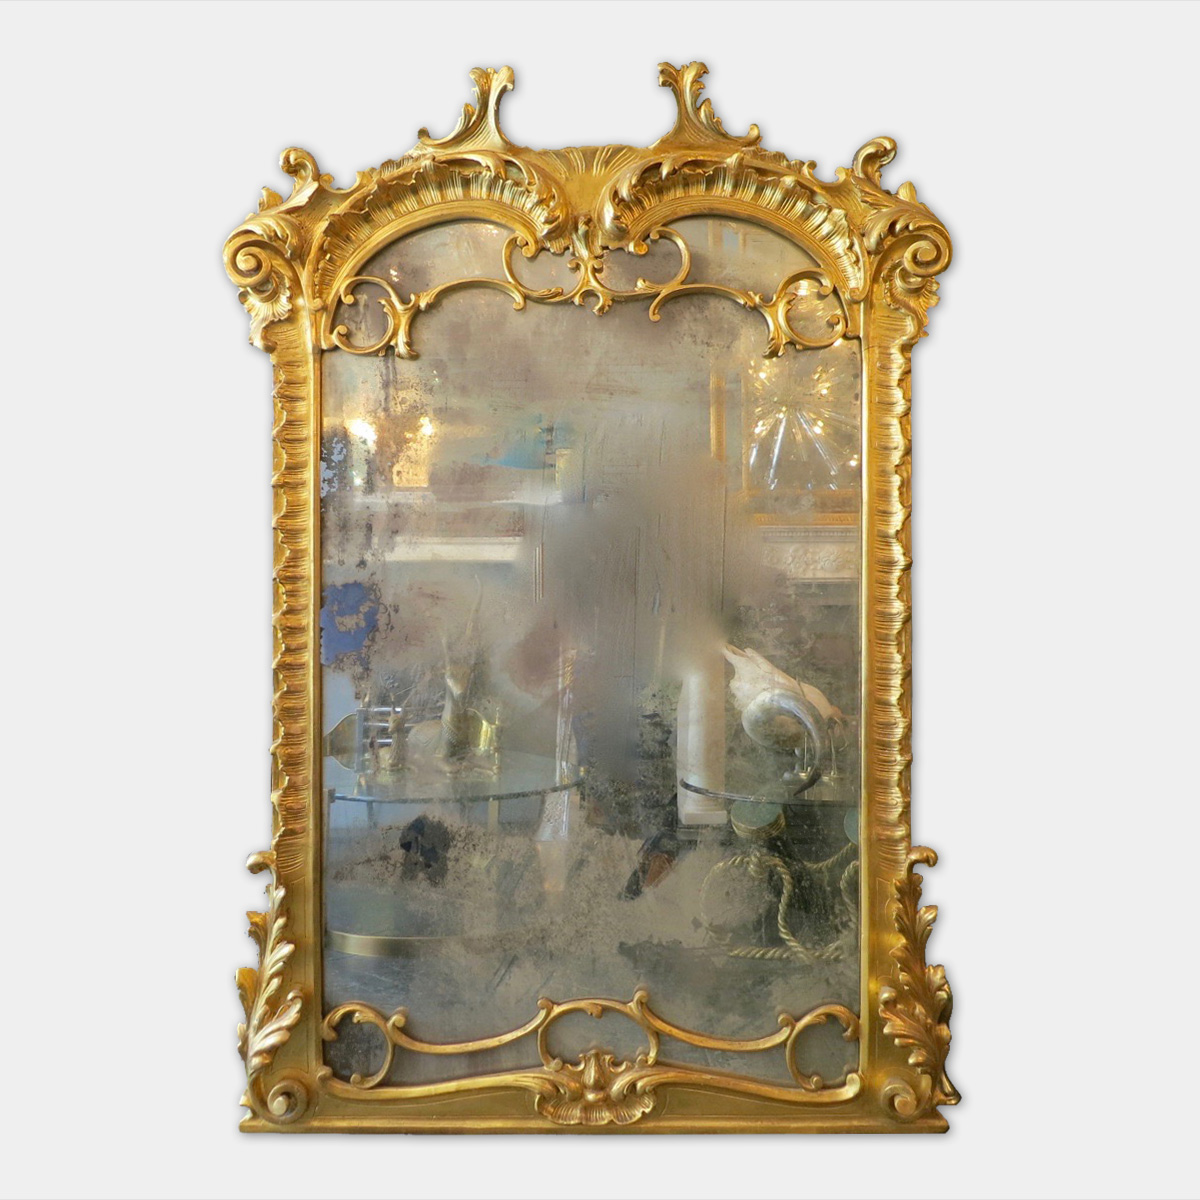 Antique Italian Baroque Style Over Mantel Mirror Marmorea London